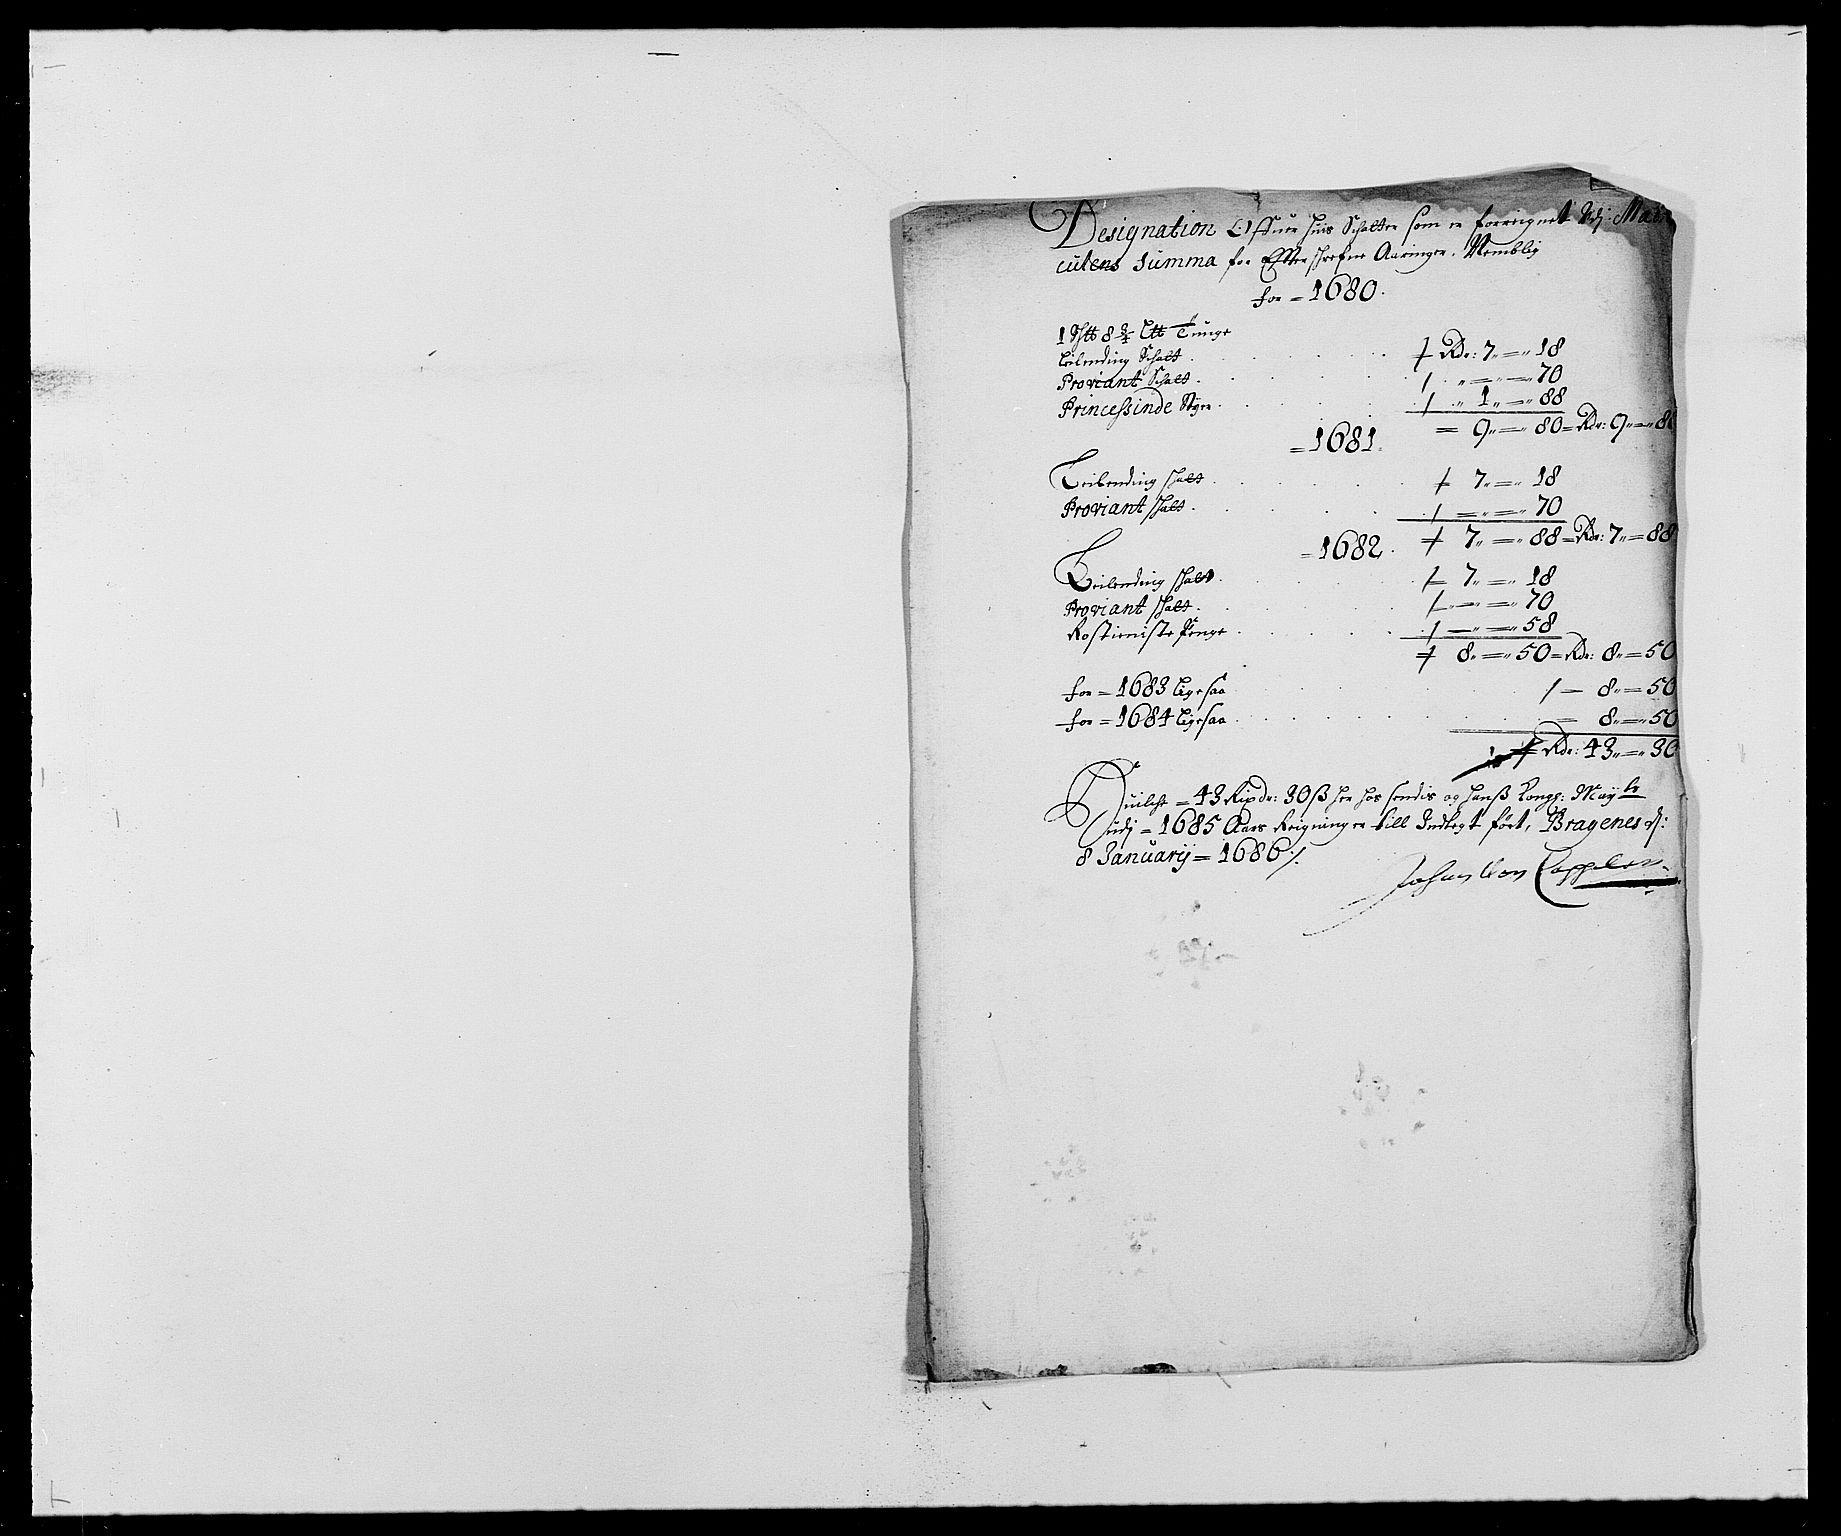 RA, Rentekammeret inntil 1814, Reviderte regnskaper, Fogderegnskap, R27/L1687: Fogderegnskap Lier, 1678-1686, s. 224